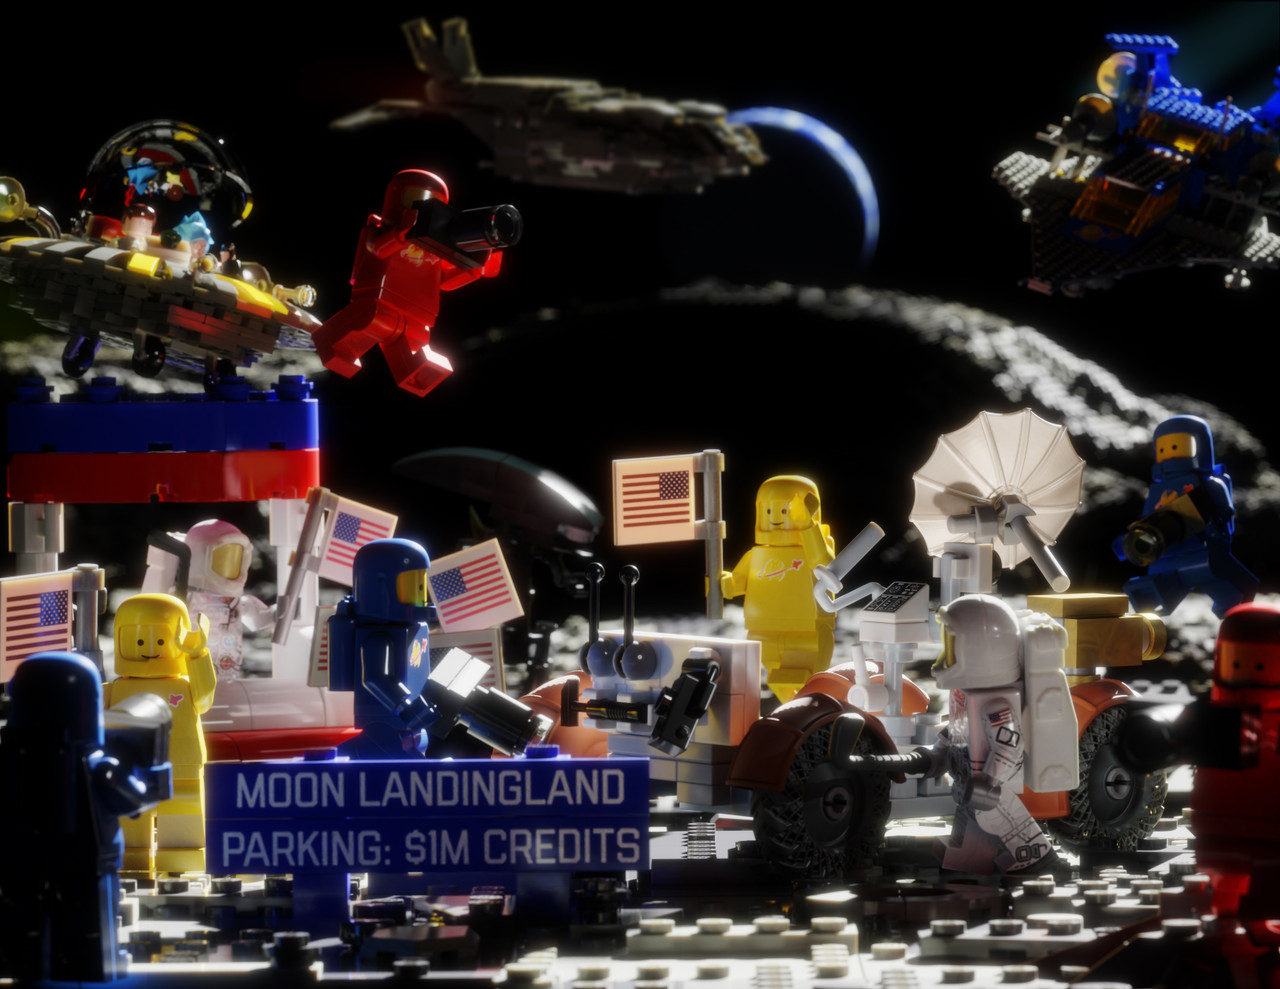 LRV - Lunar Rover Vehicle